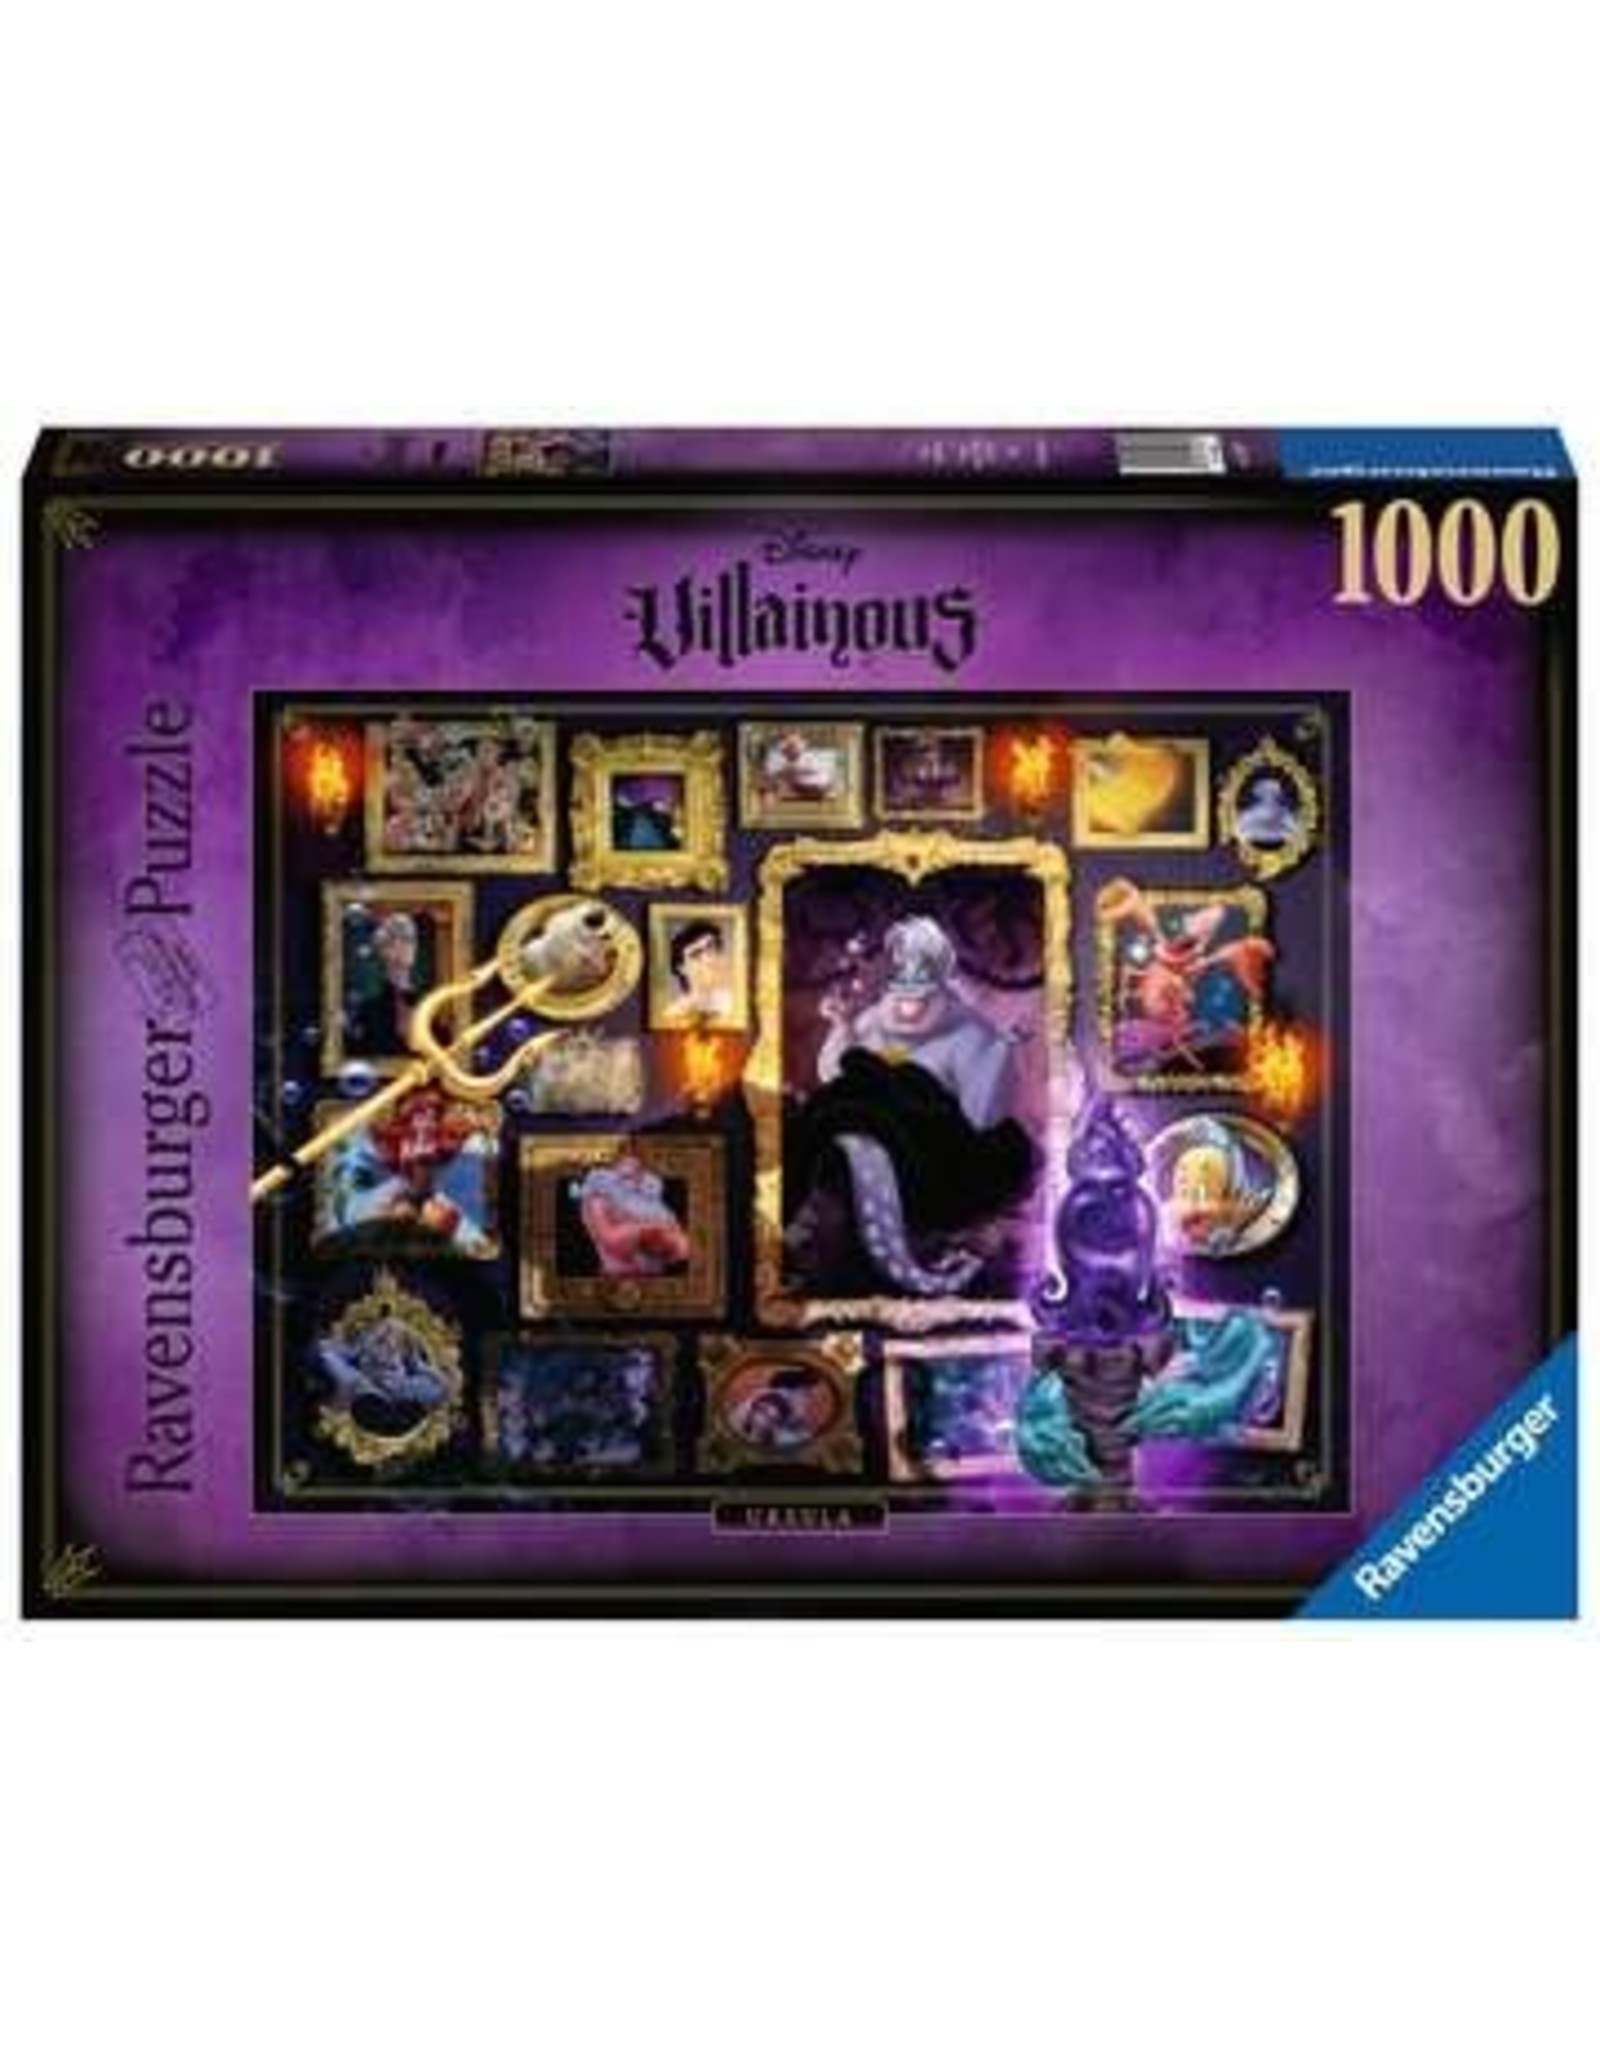 Ravensburger Villainous: Ursula